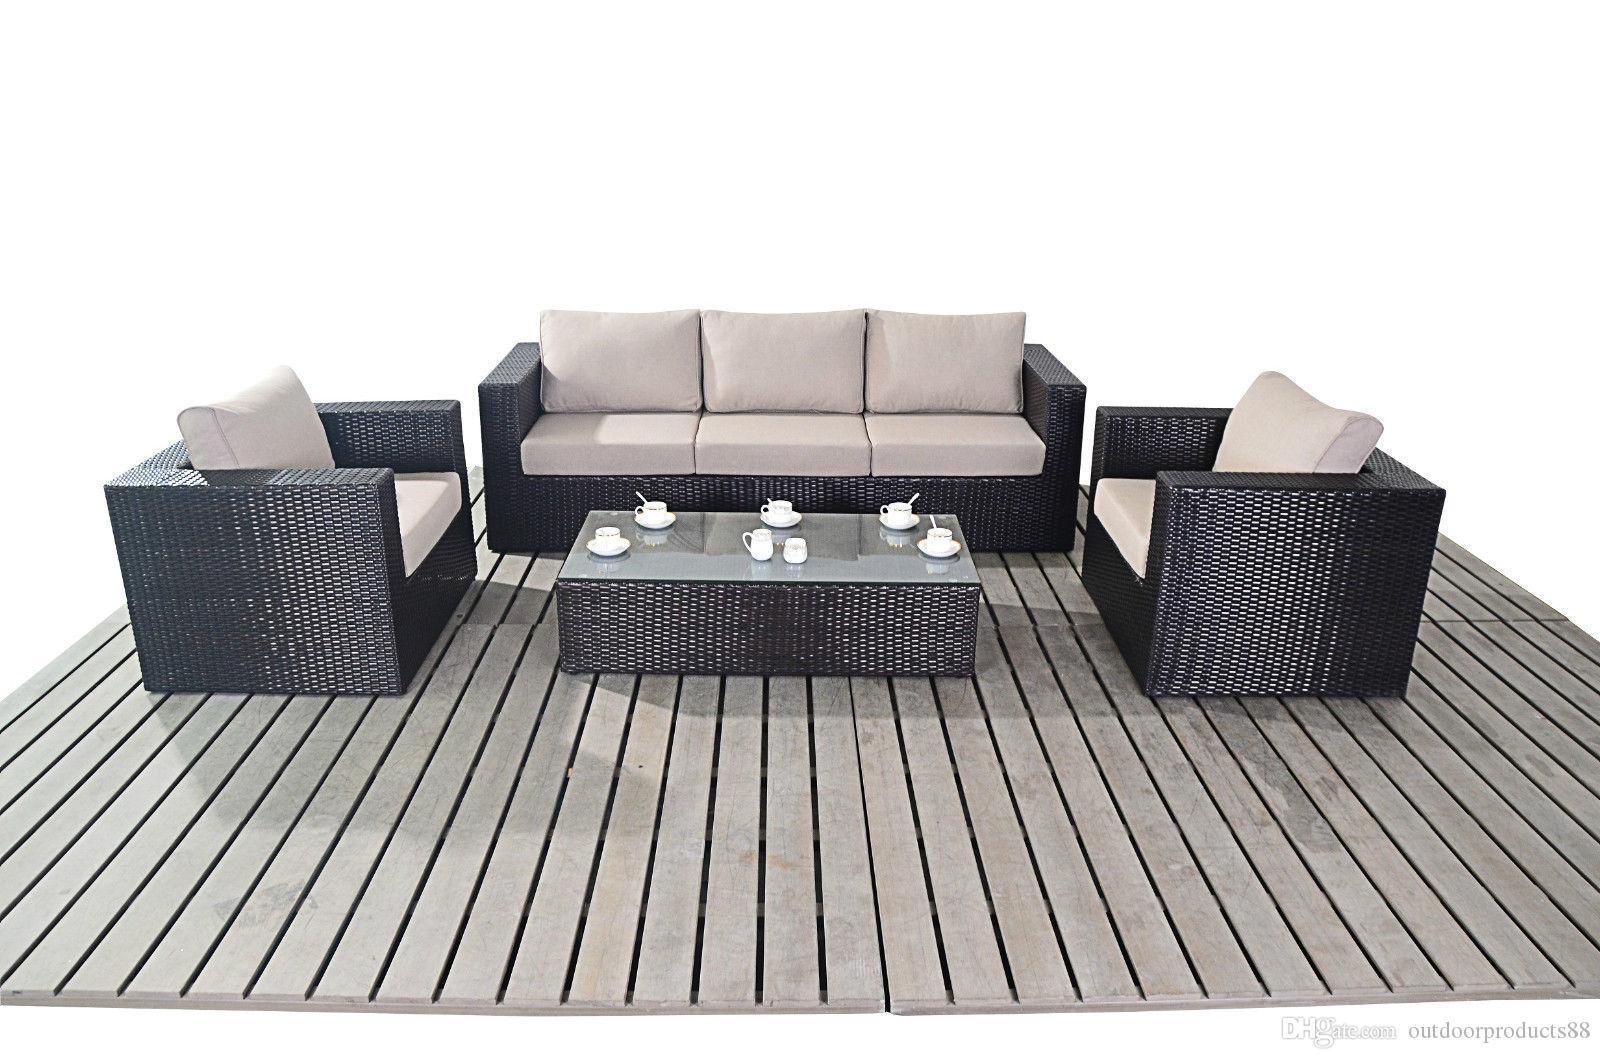 2018 rattan wicker chair sofa table combinationpatio balcony rattan wicker table and chairoutdoor rattan sofa set garden furniturerattan sofa from